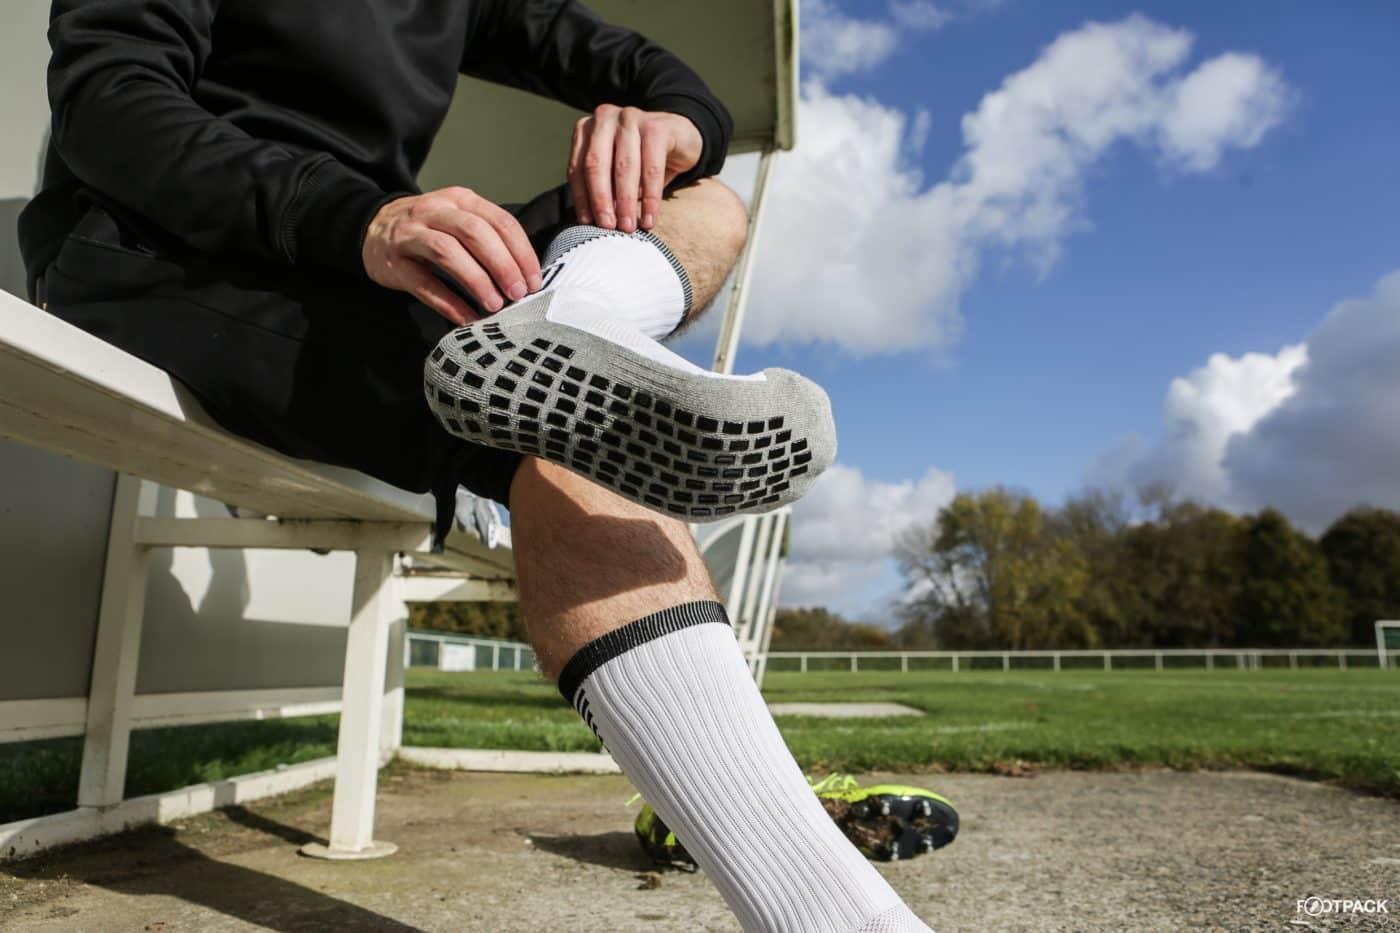 mc-protech-protege-tibias-chaussettes-footpack-5